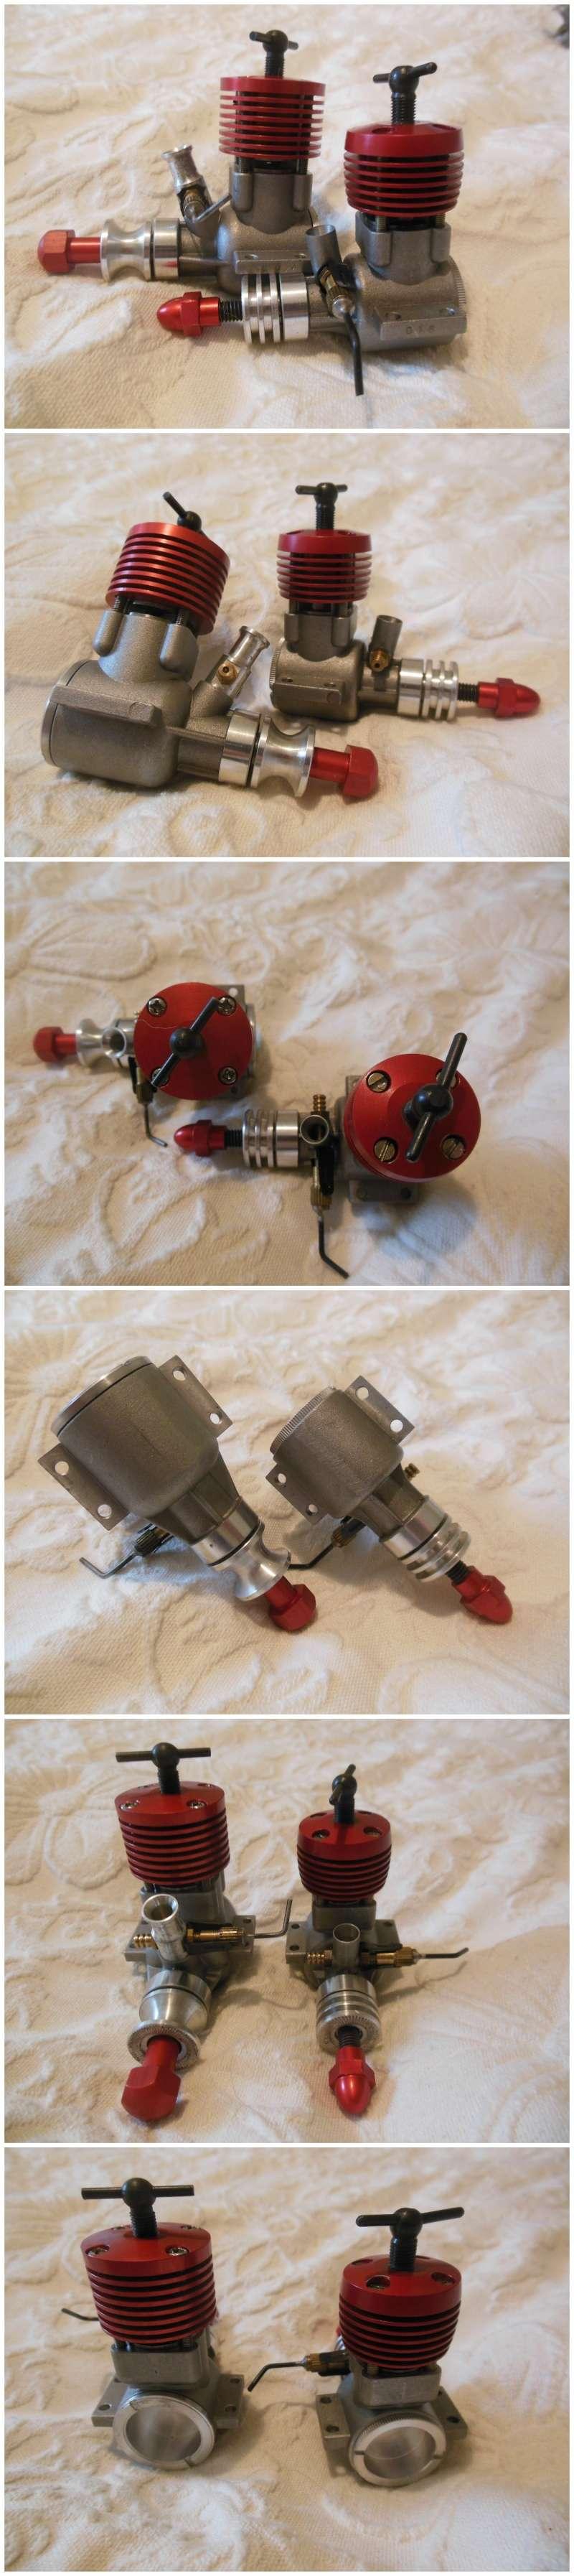 RedFin Engines Redfin12